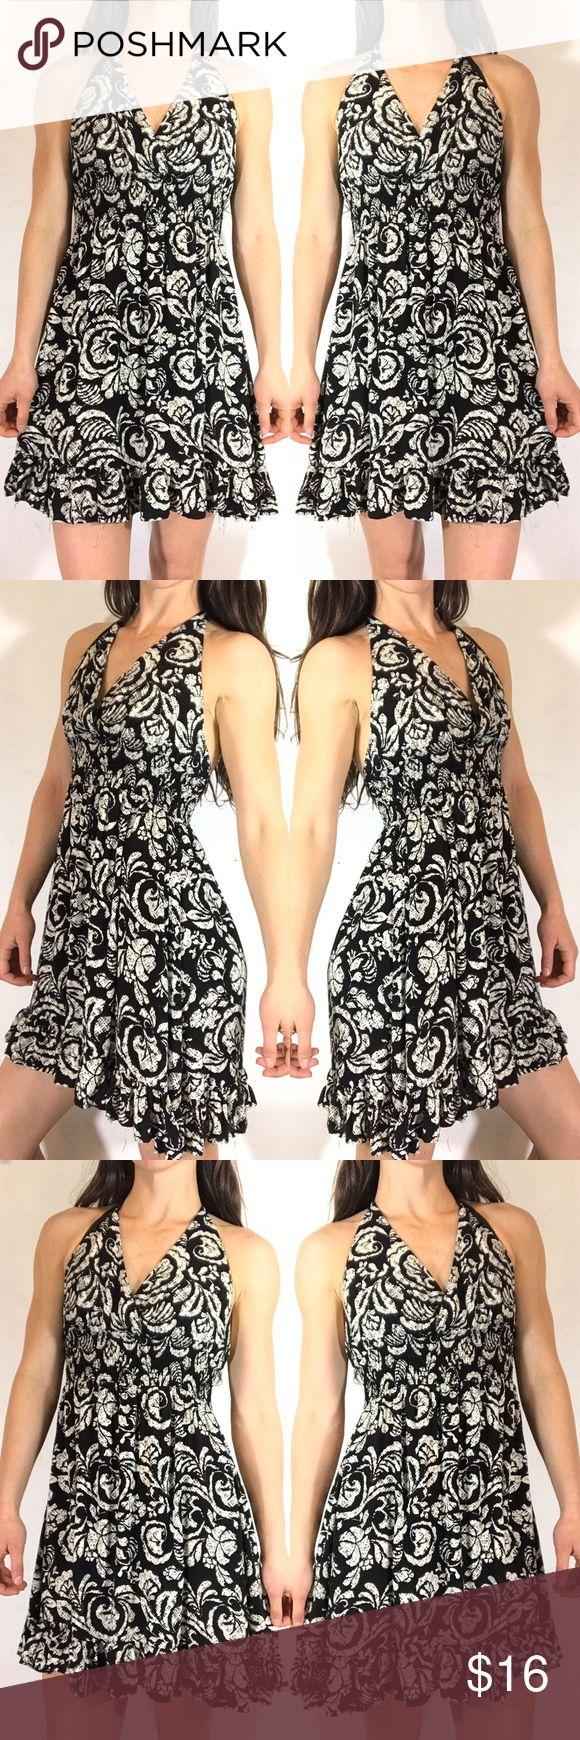 POETRY BLACK AND WHITE FLORAL HALTER MINI DRESS M Black and white floral halter dress. Size medium Poetry Dresses Mini